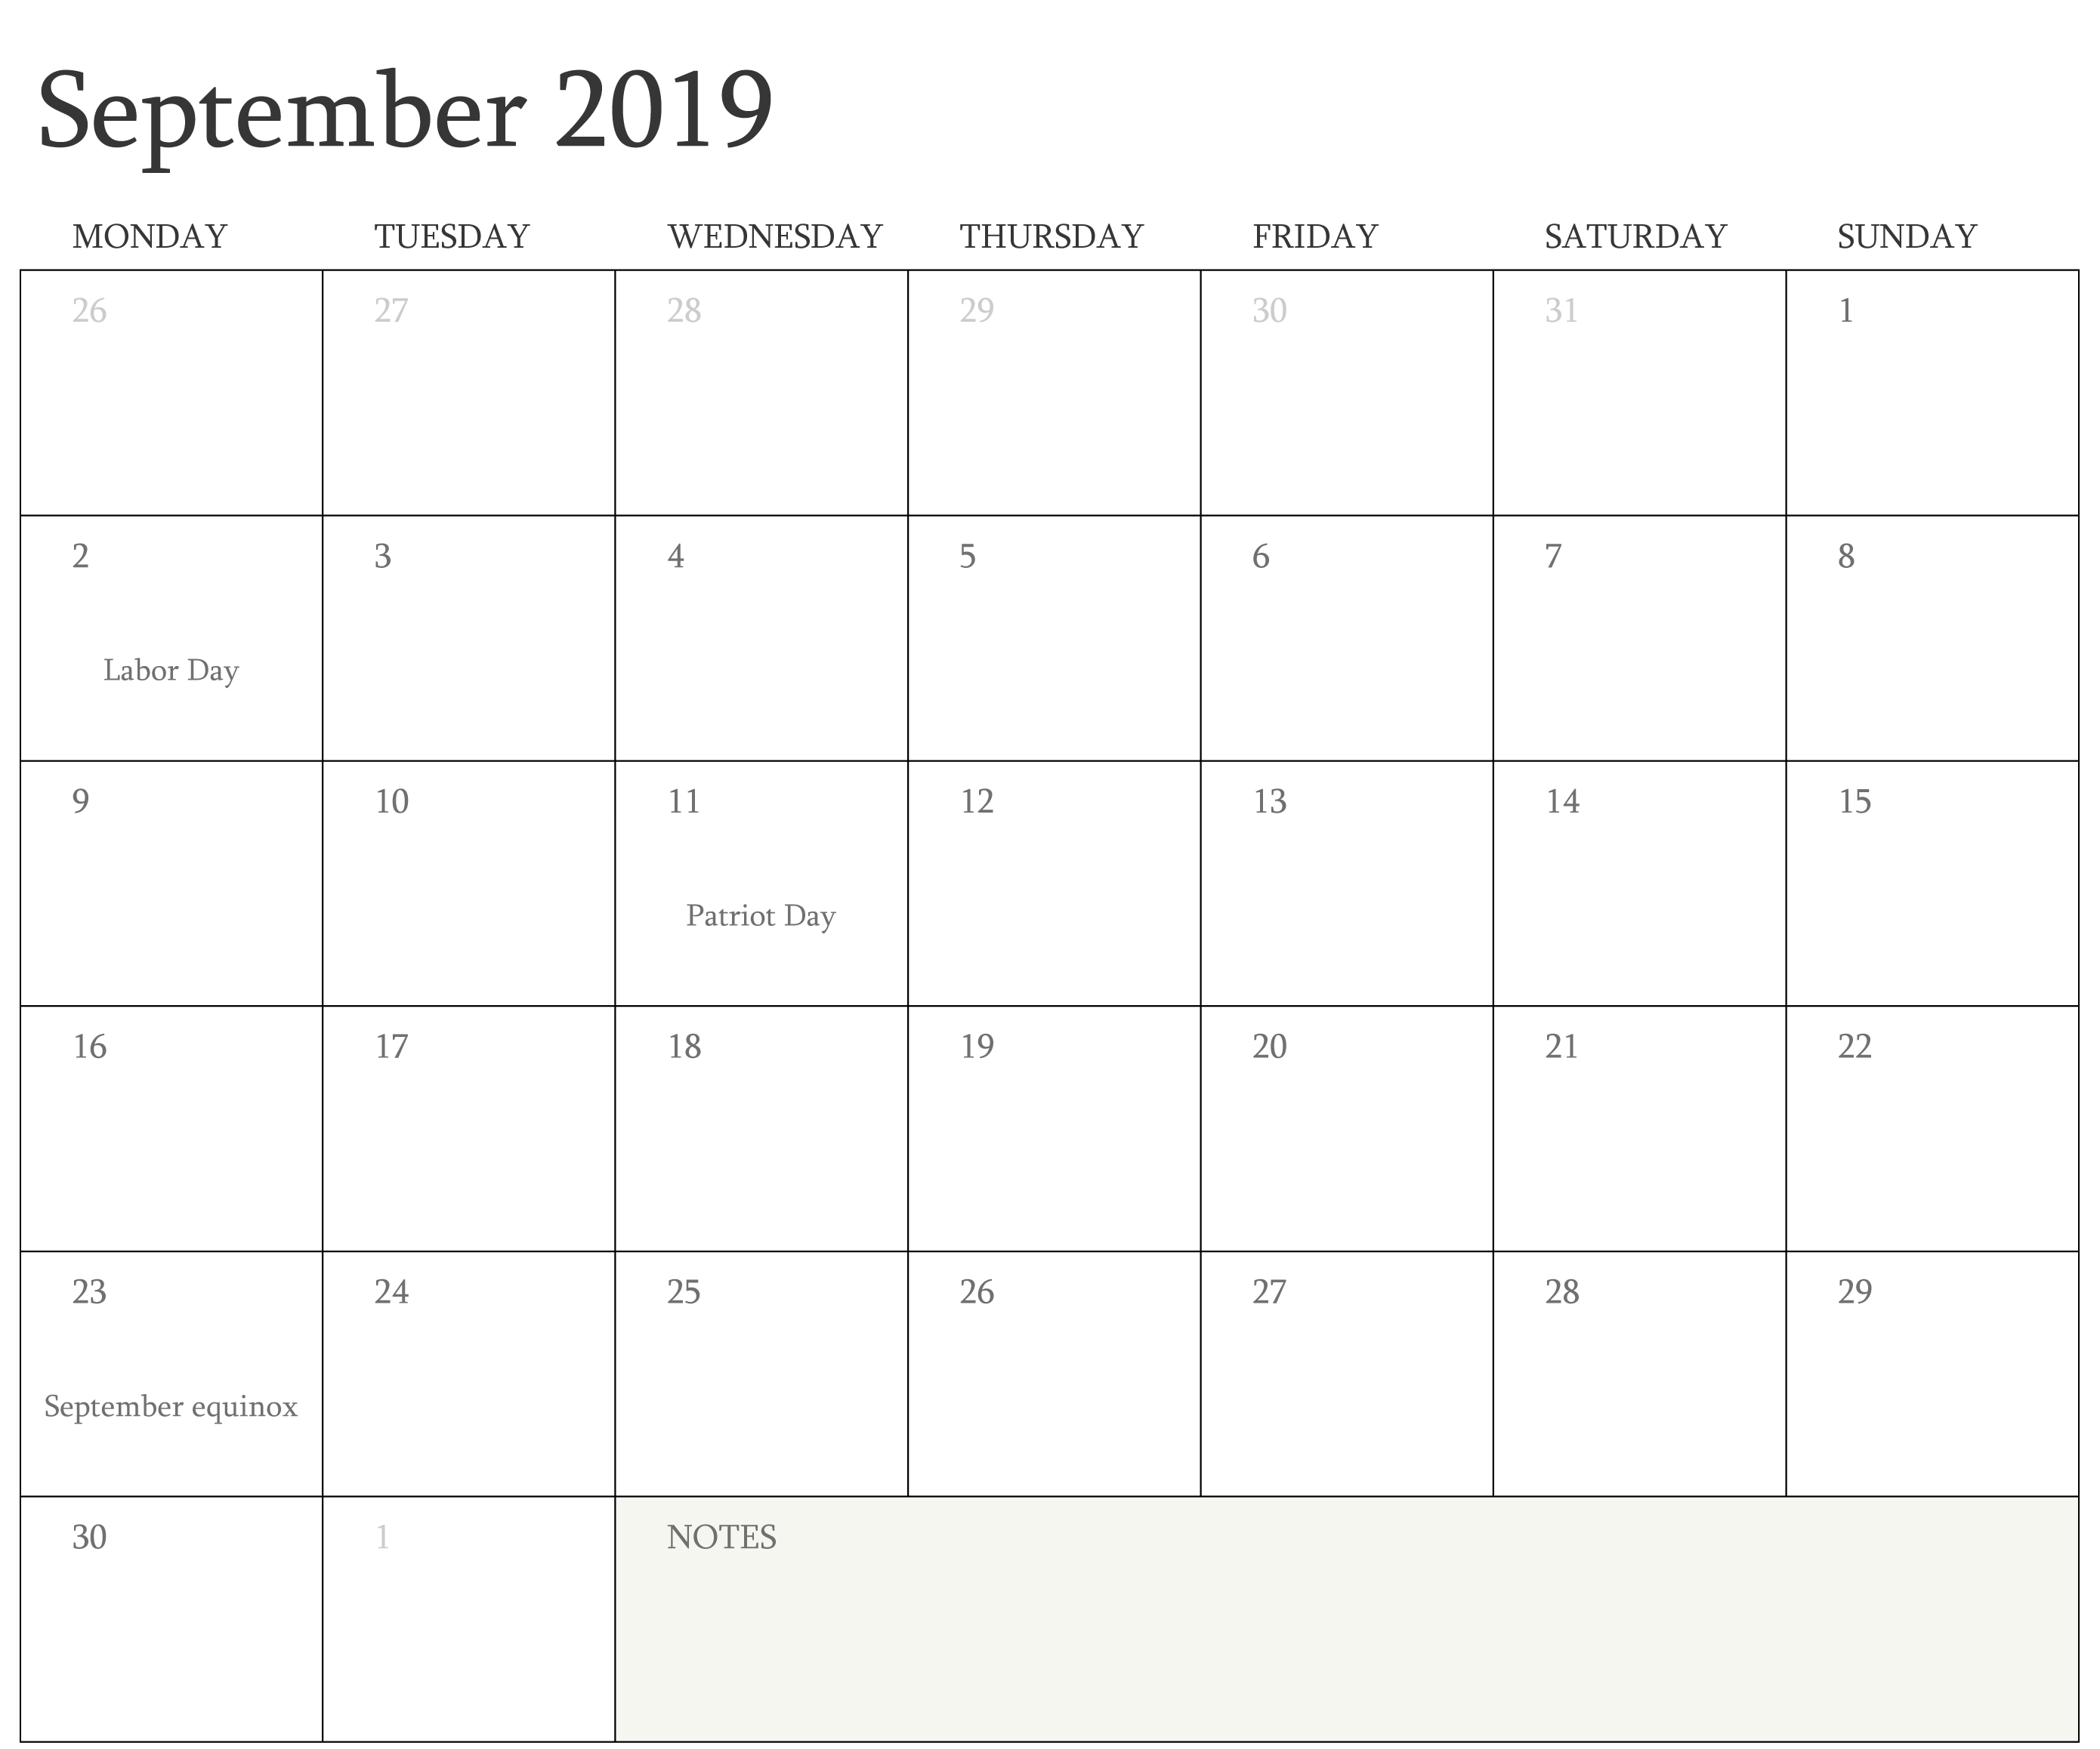 September Calendar 2019 Holidays